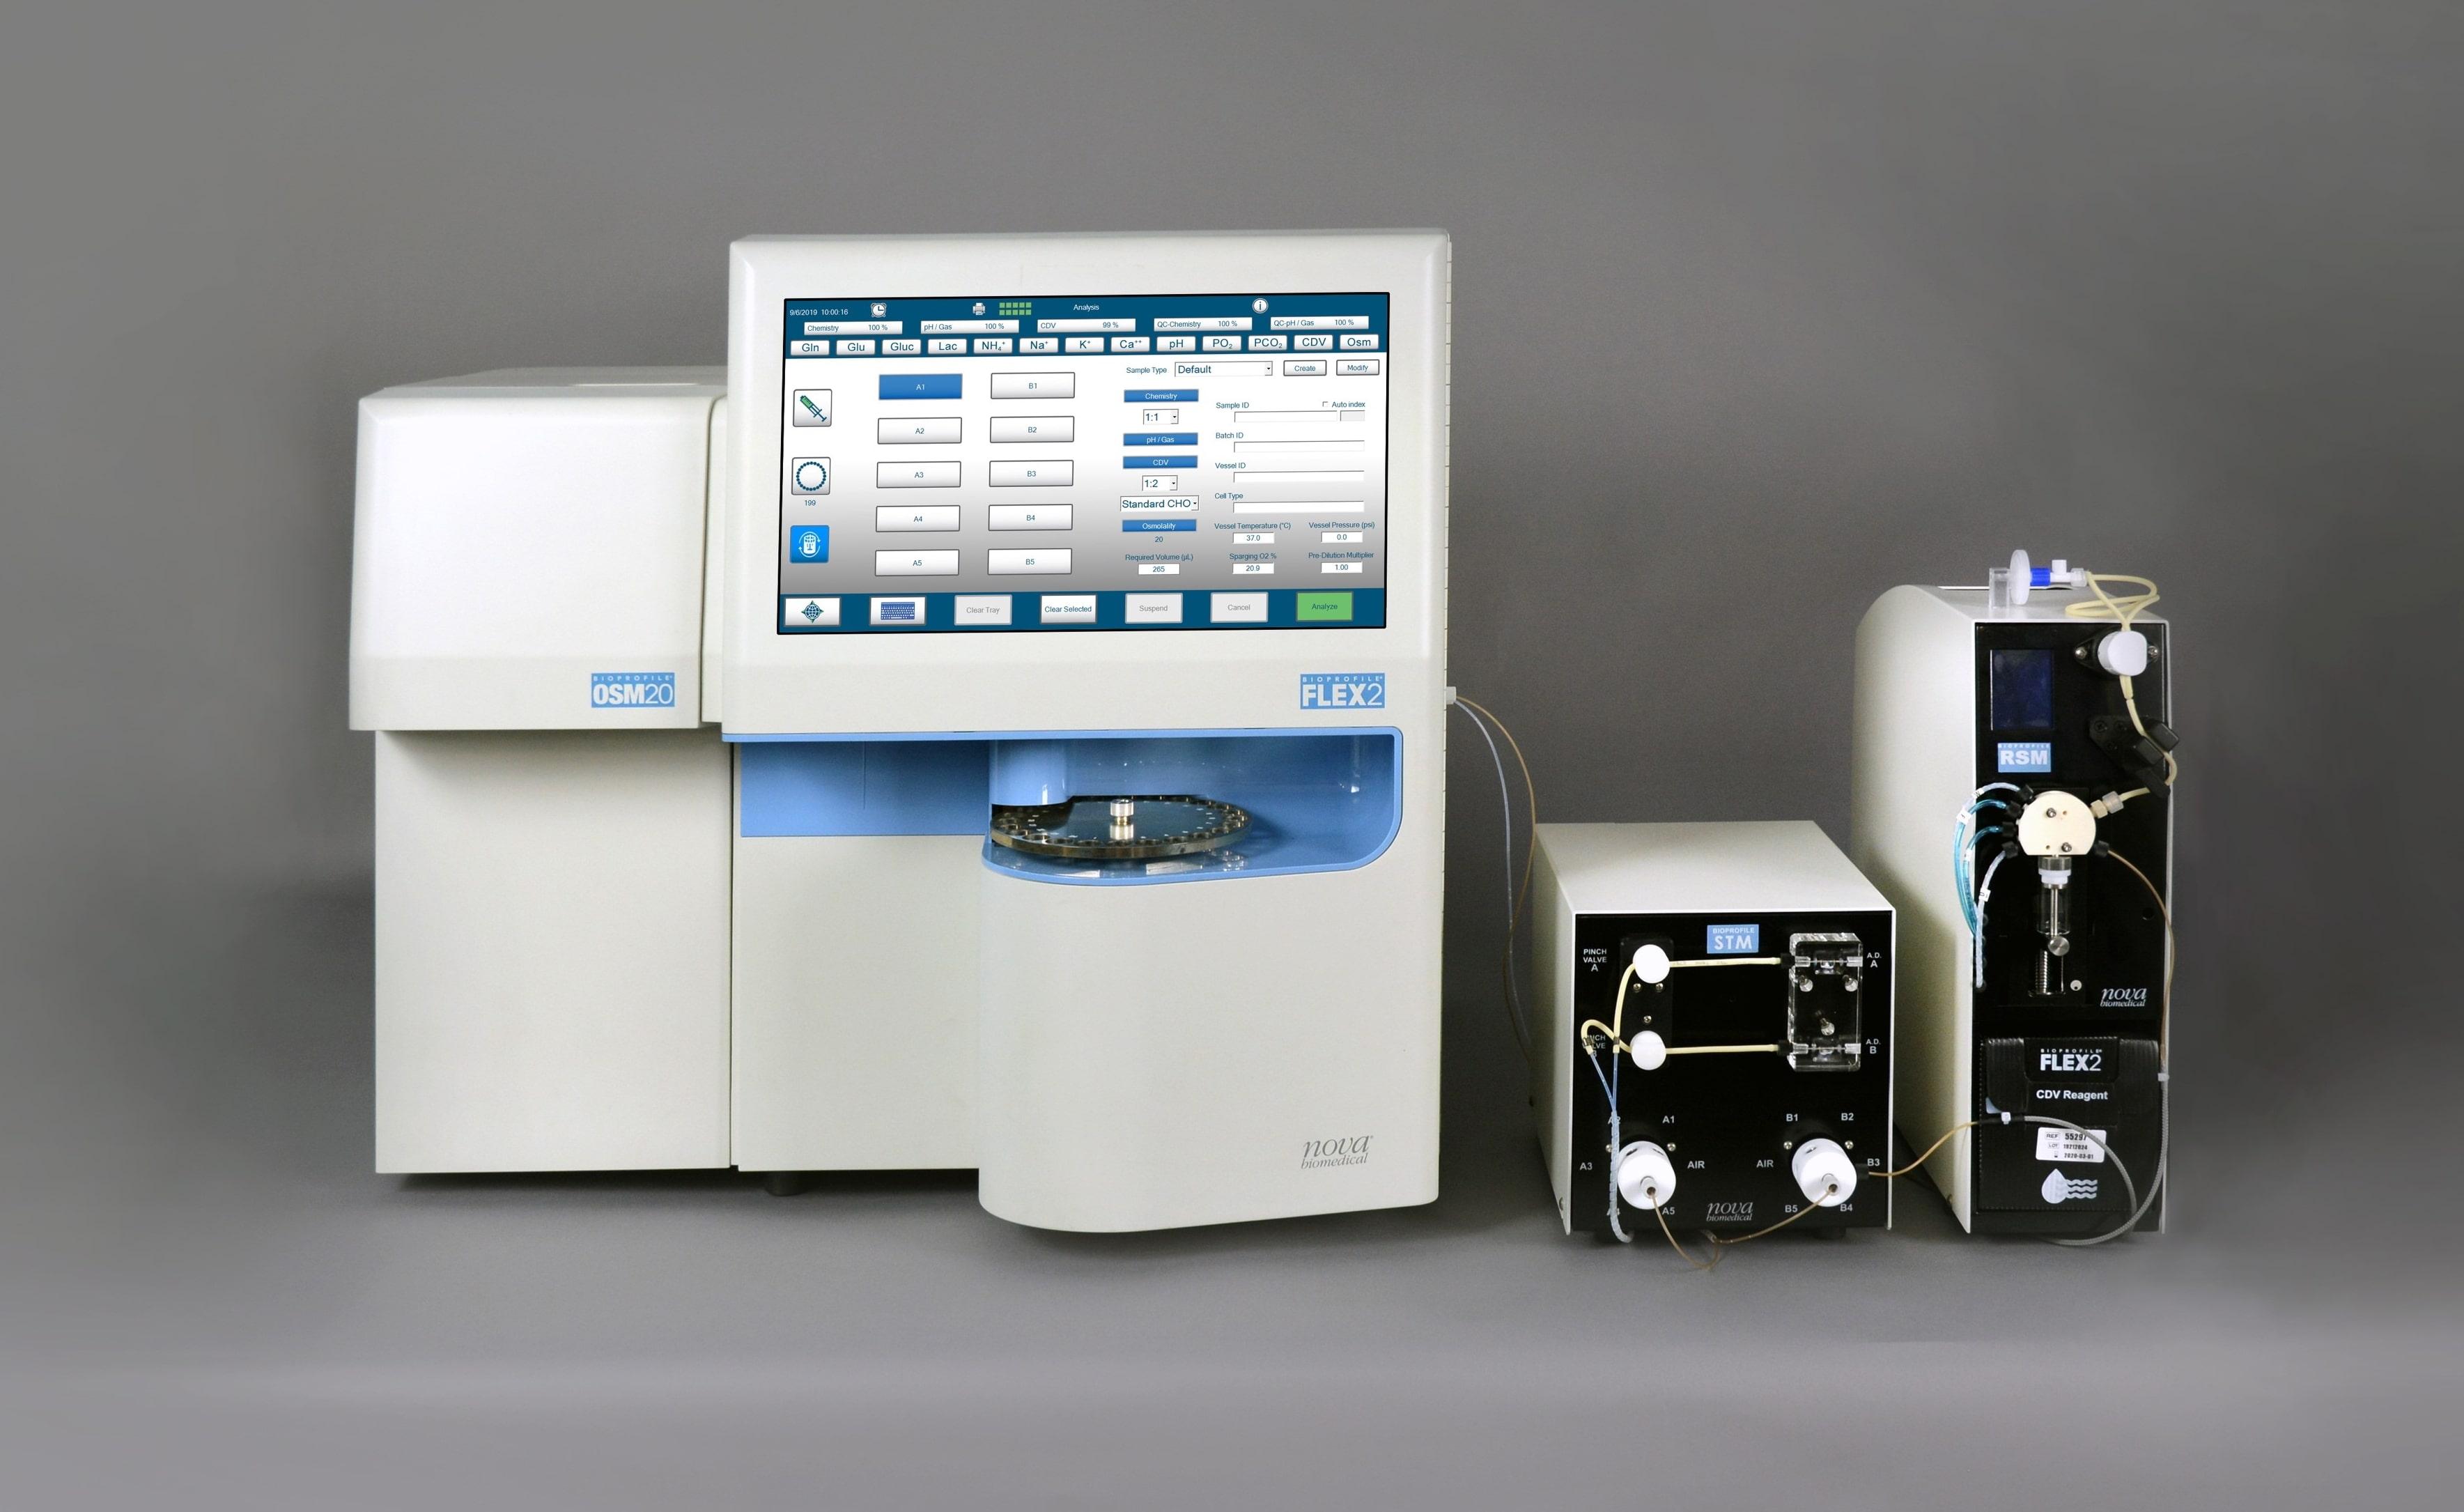 Image: BioProfile FLEX2 Cell Culture Analyzer (Photo courtesy of Nova Biomedical)